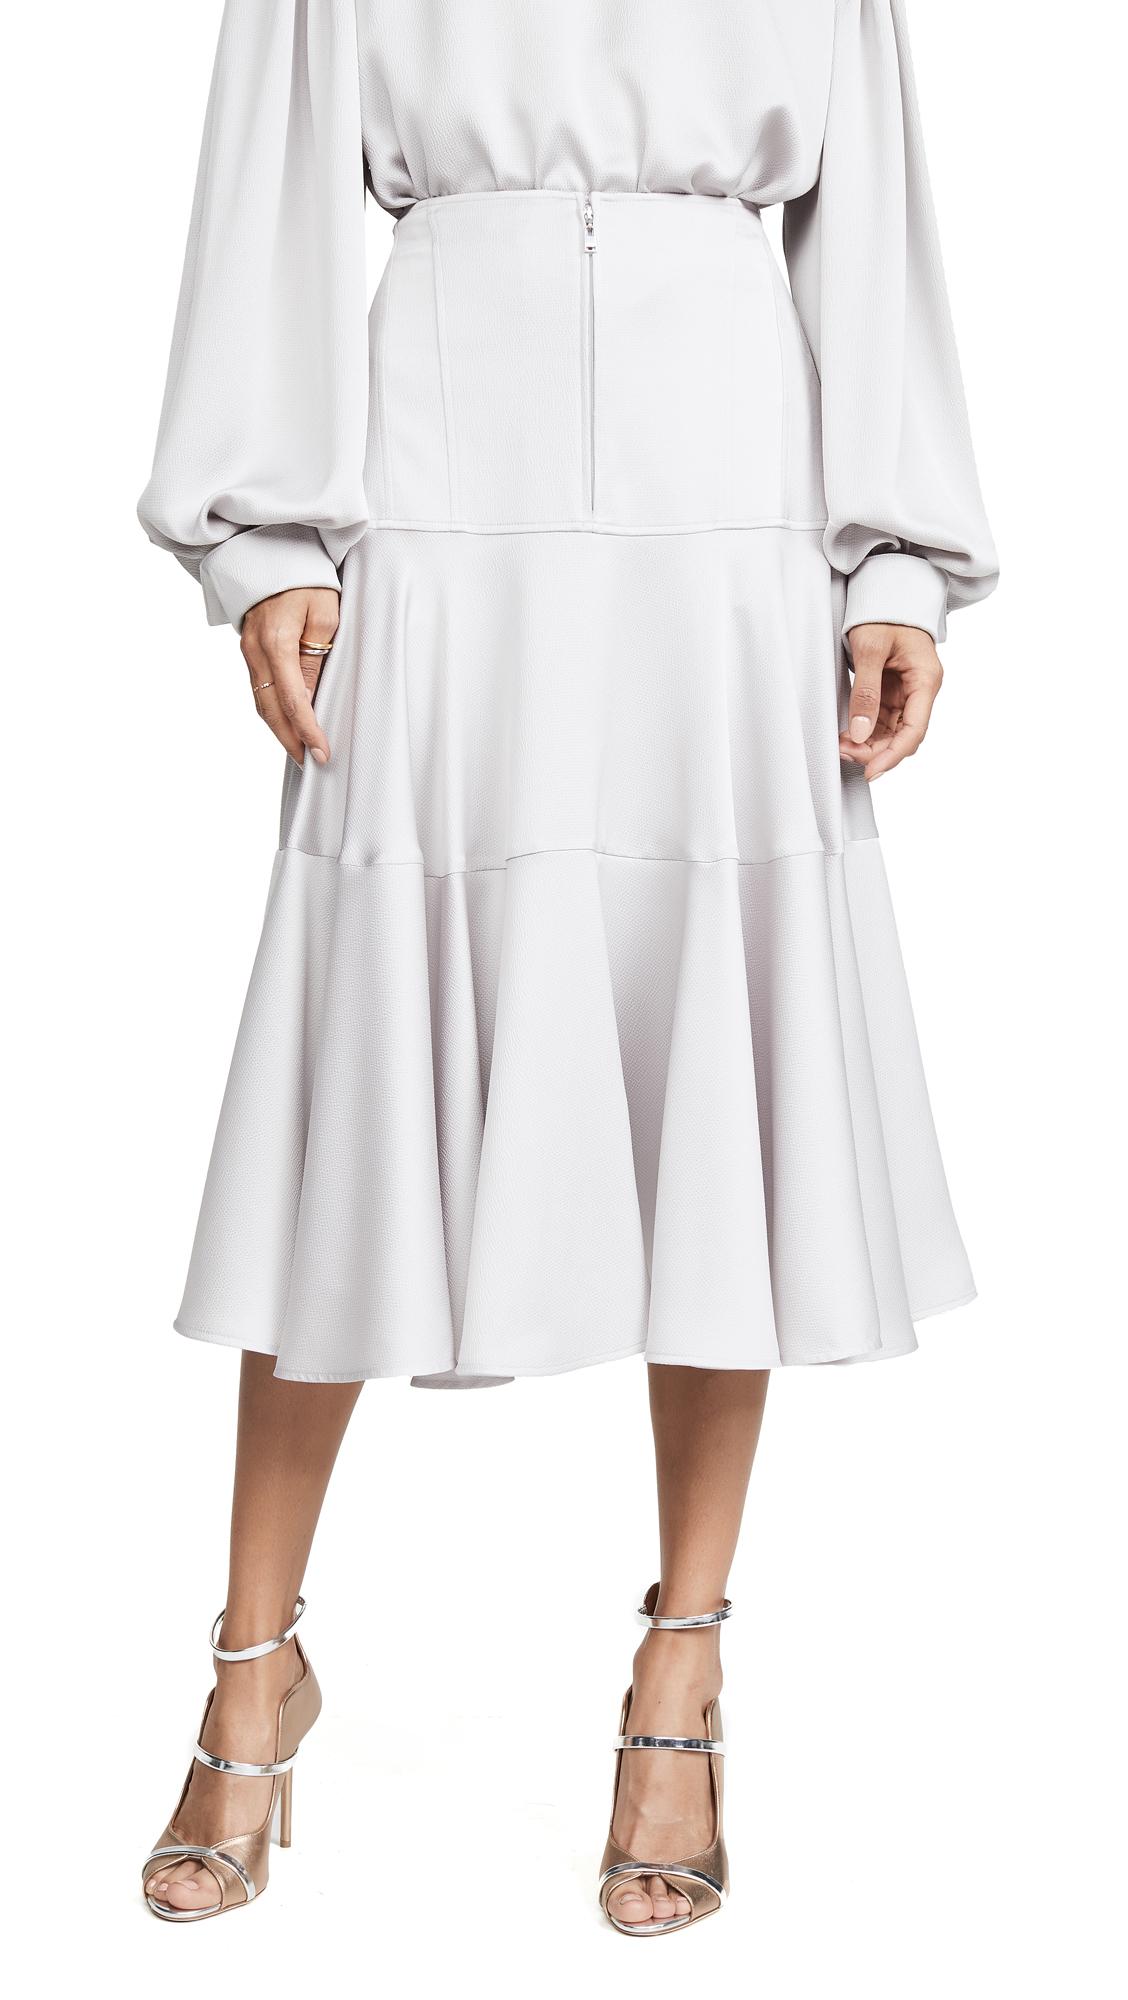 Adeam Corset Skirt - Dove